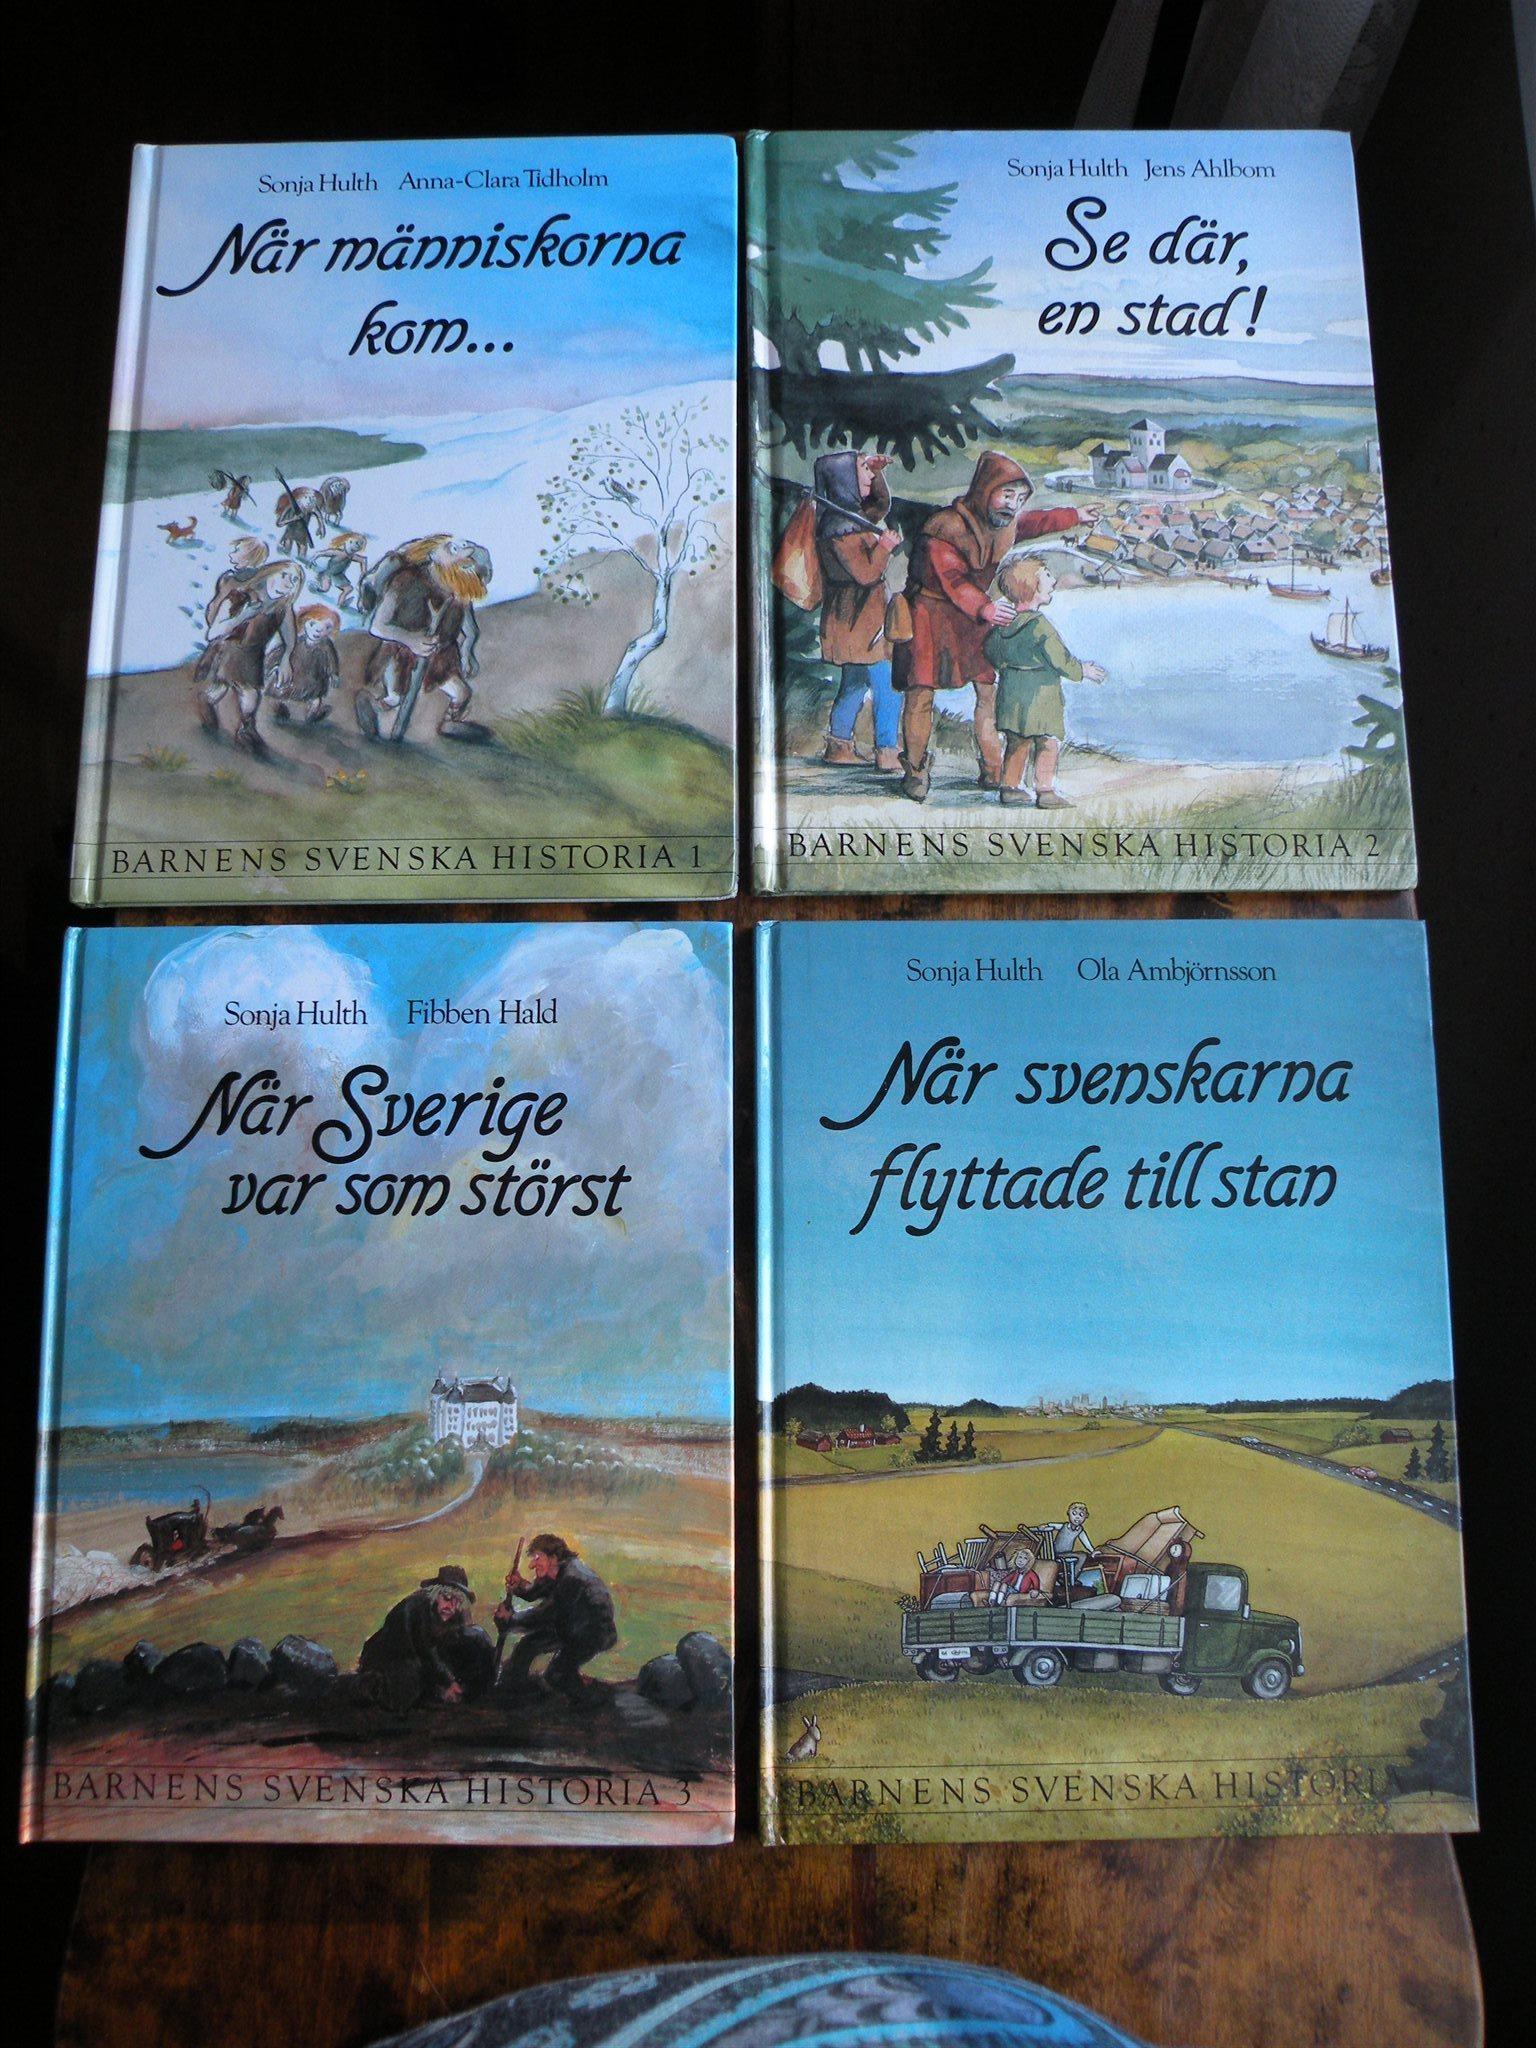 Bok: BARNENS SVENSKA HISTORIA av Sonja Hulth